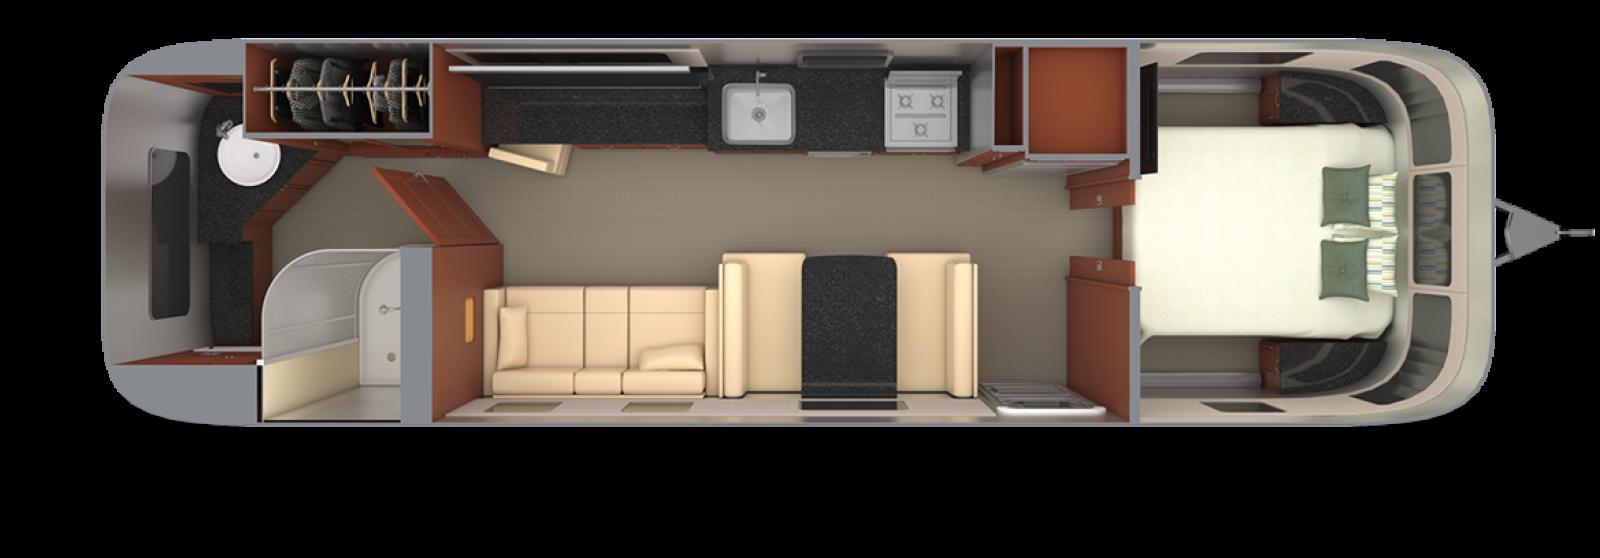 Airstream-Classic-33FB Mocha-Cherry-with-Macadamia-Floor-Plan